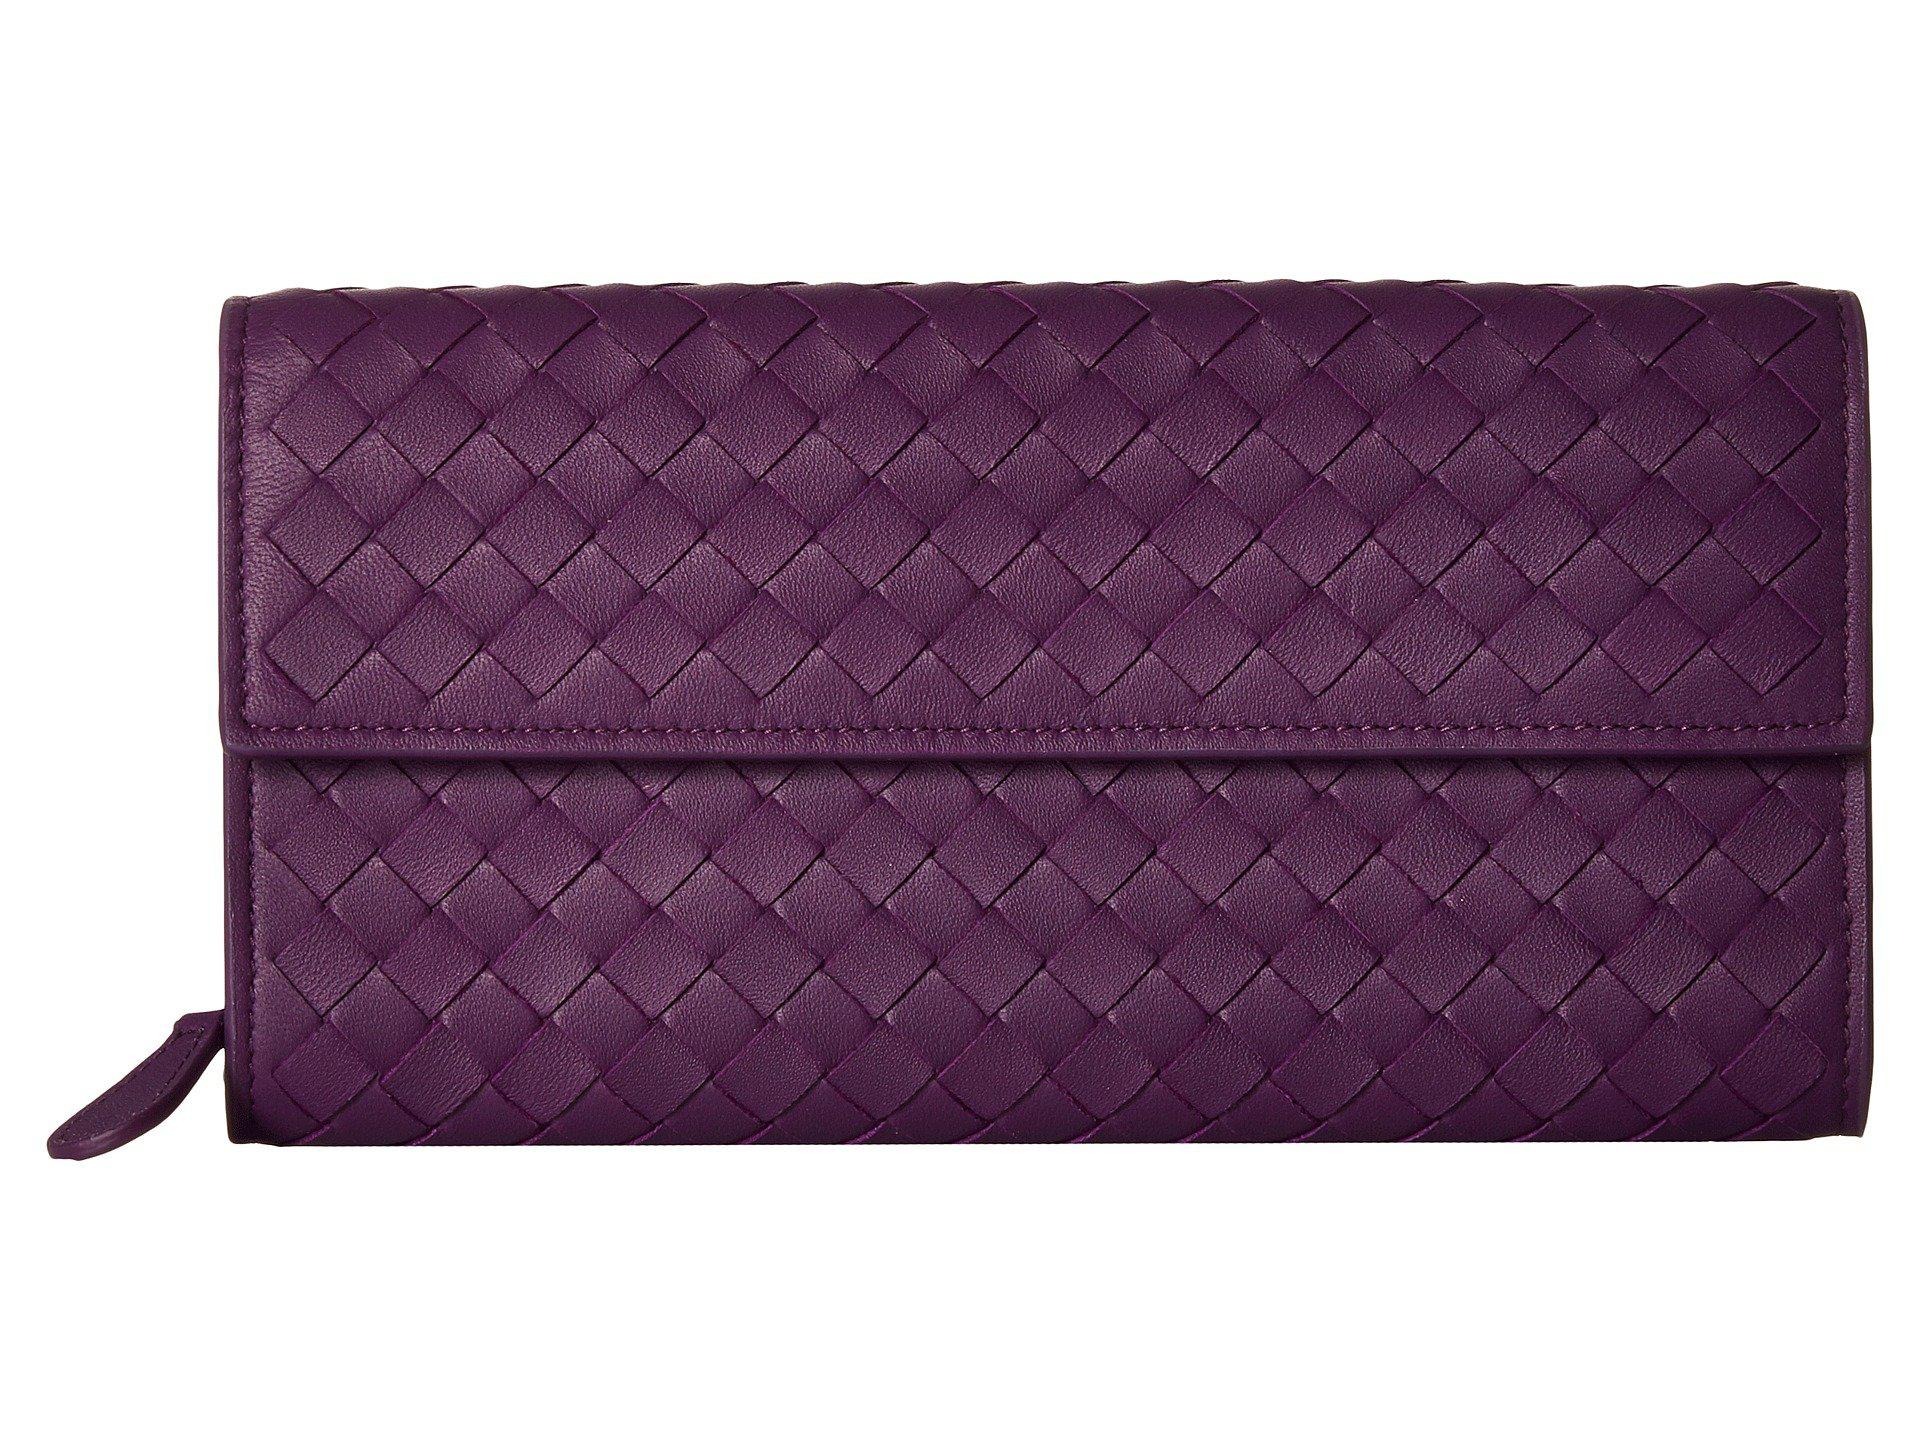 56543d250de9 Lyst - Bottega Veneta Intrecciato Flap Coin Purse Wallet (dark ...